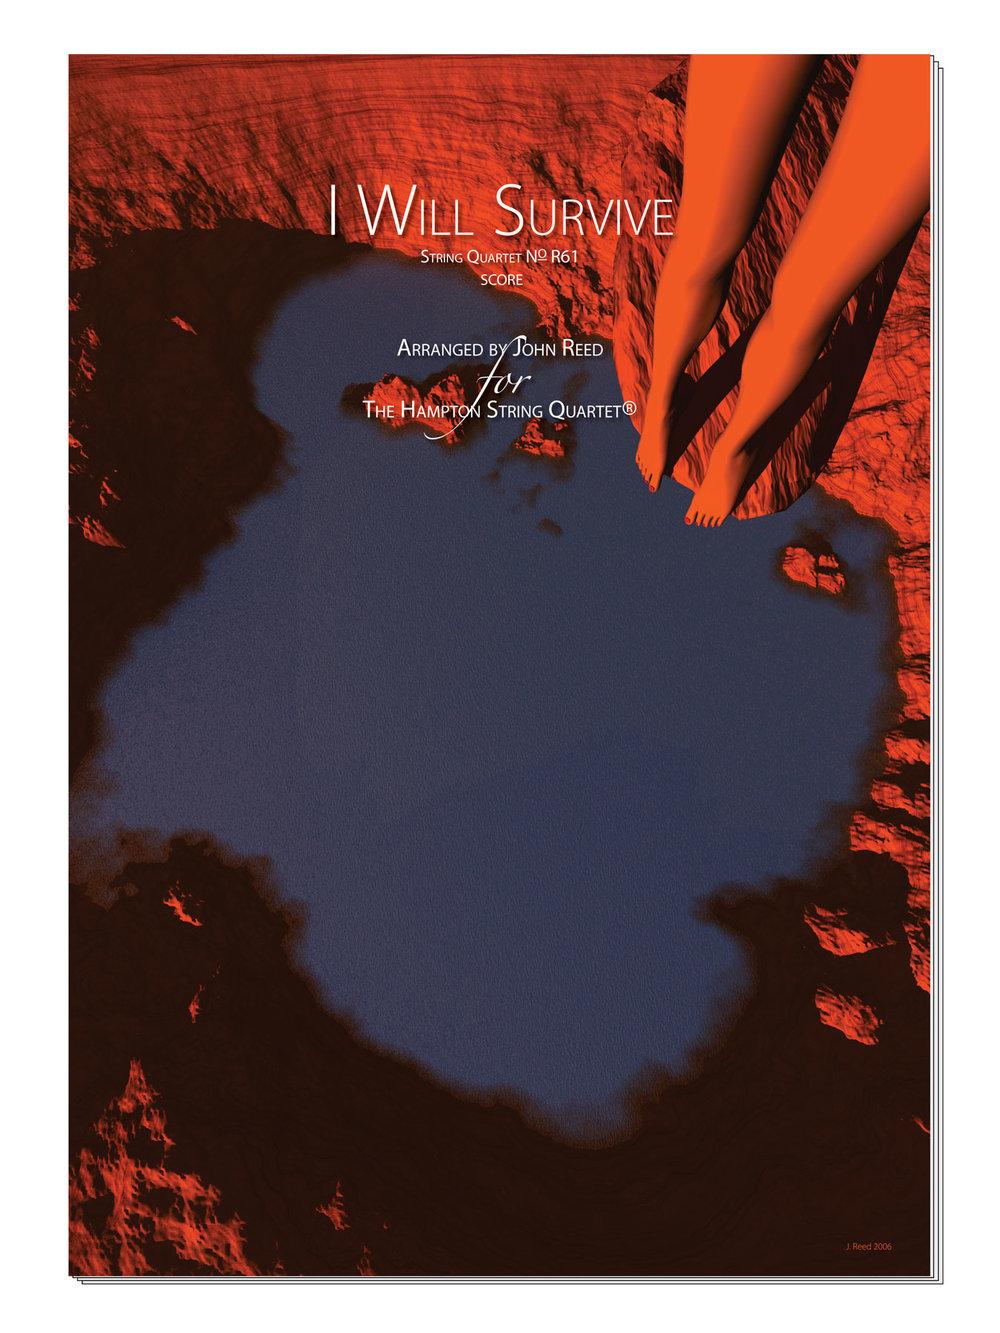 IWillSurvive.jpg